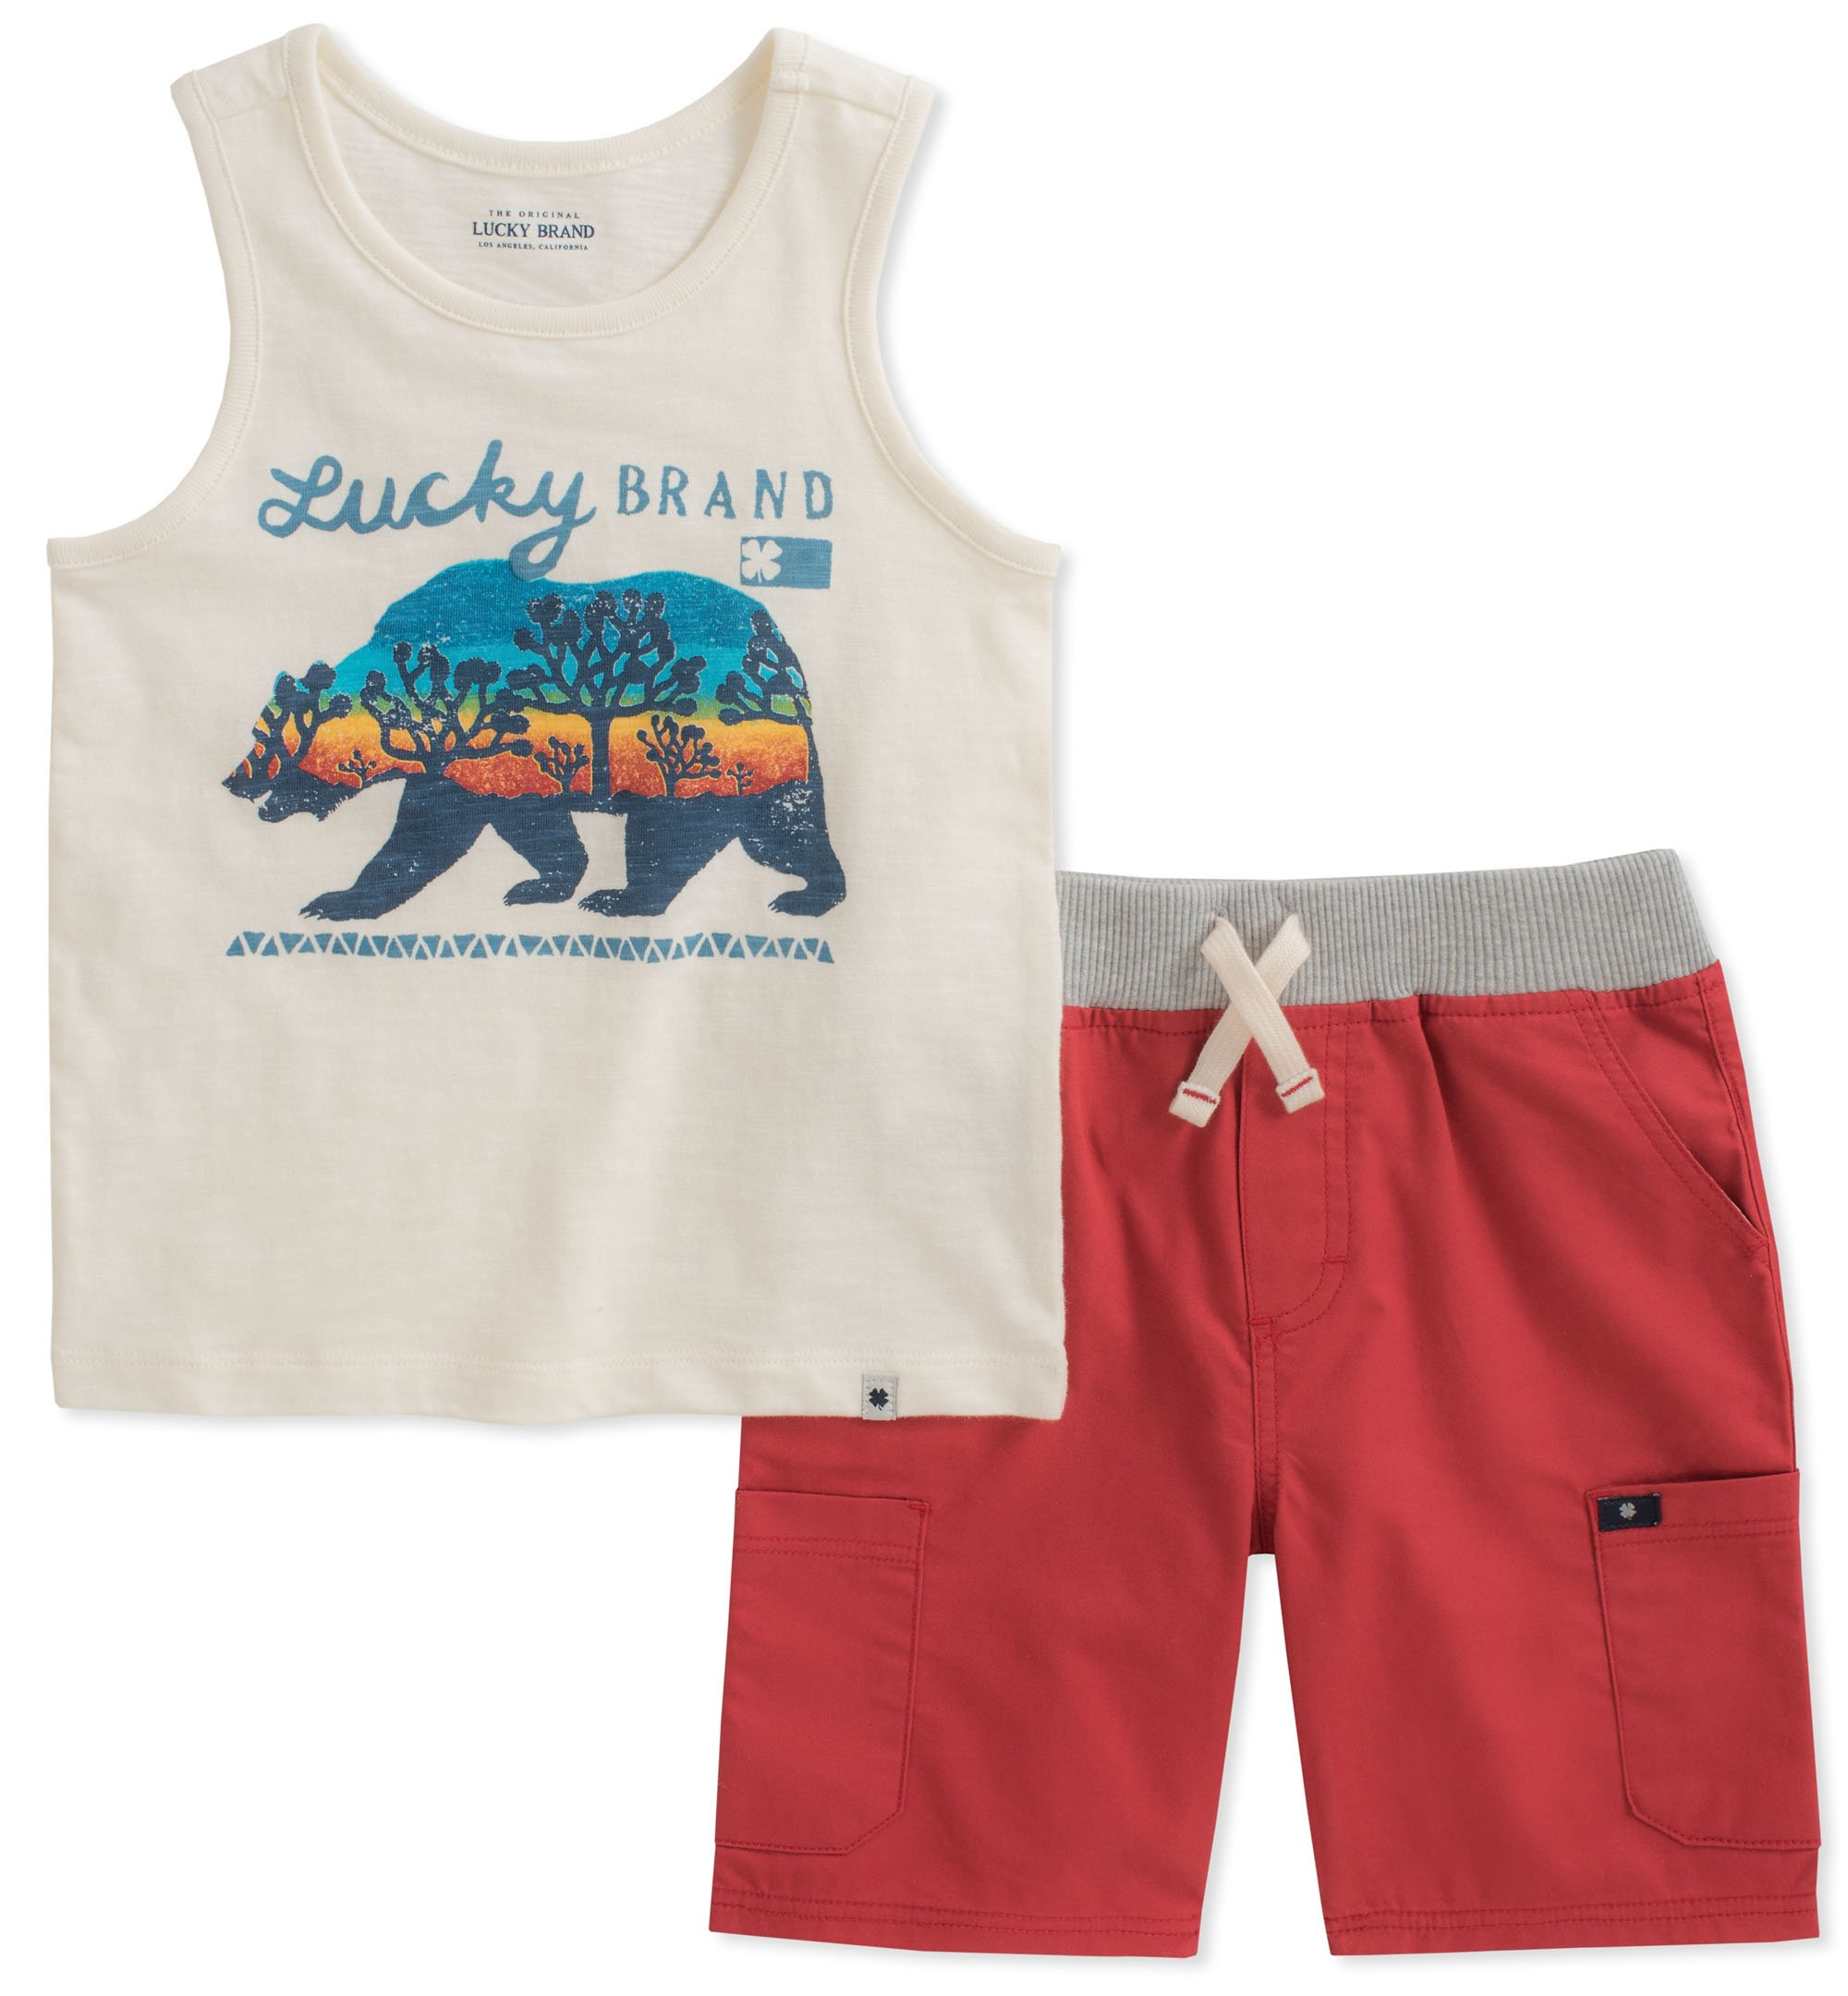 Lucky Brand Little Boys' Tank Top Shorts Set, Oatmeal/Red, 5